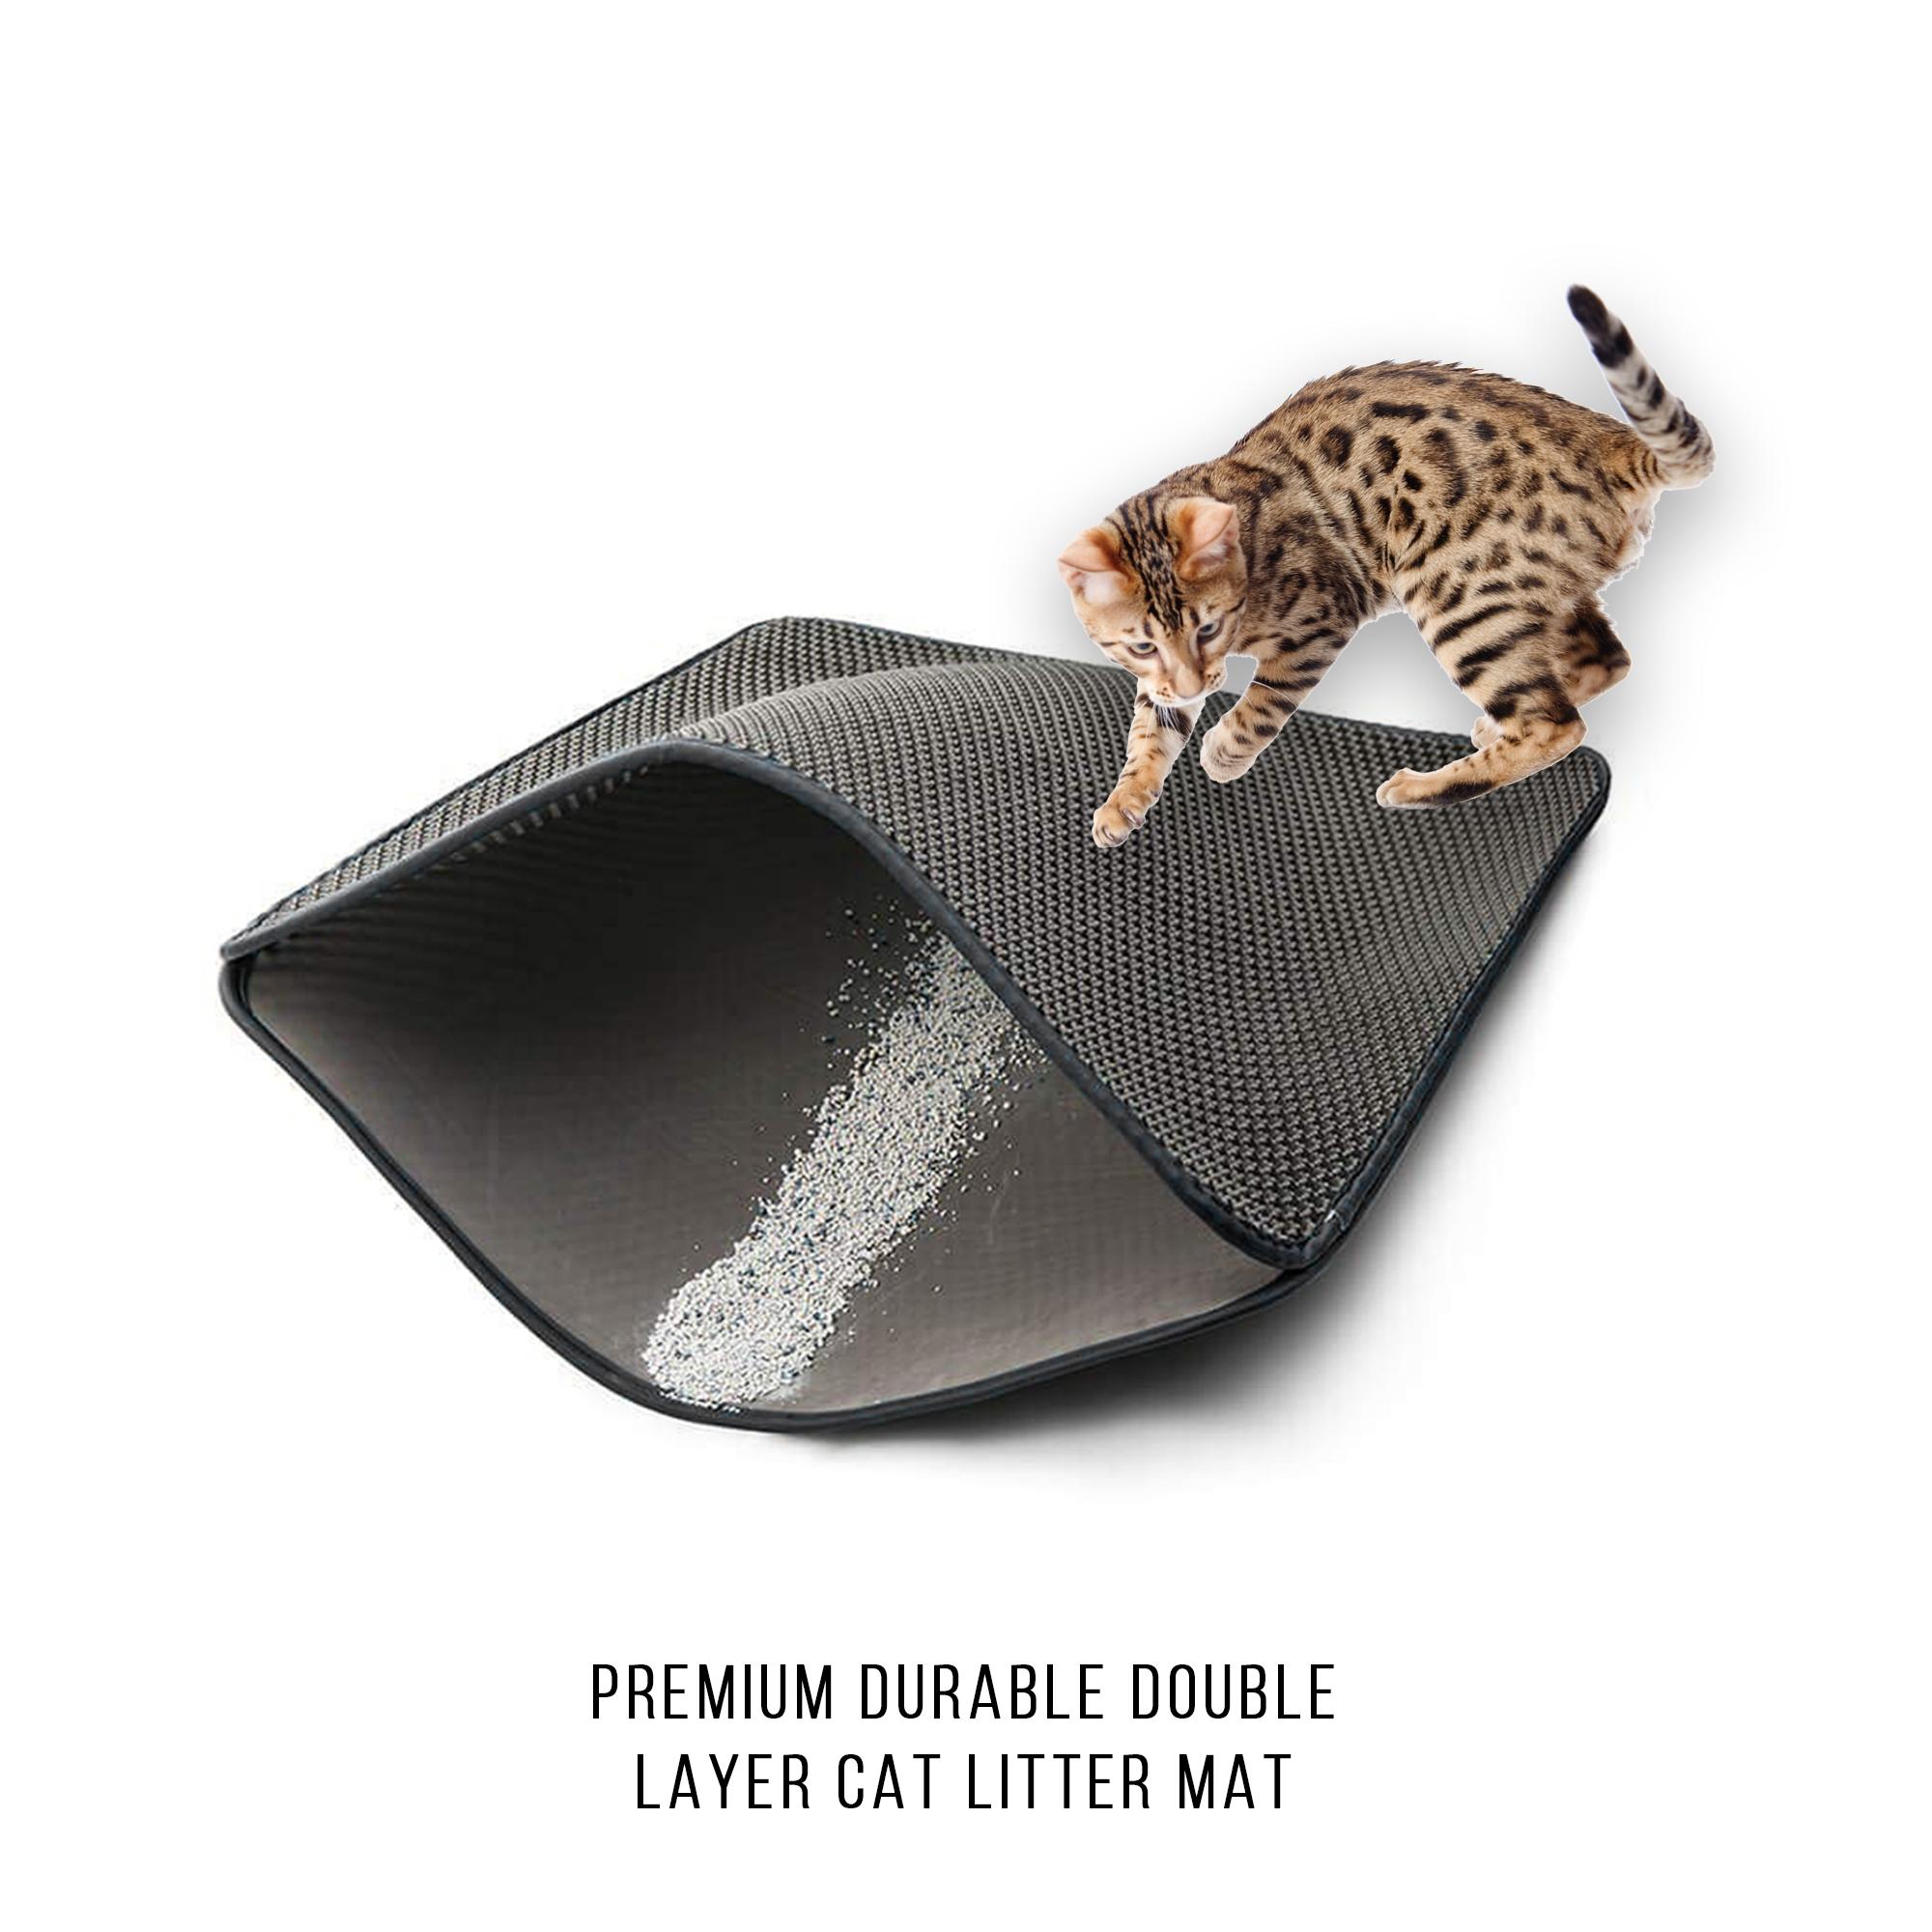 Pet Craft Supply Premium Durable Double Layer Cat Litter Mat Trapper